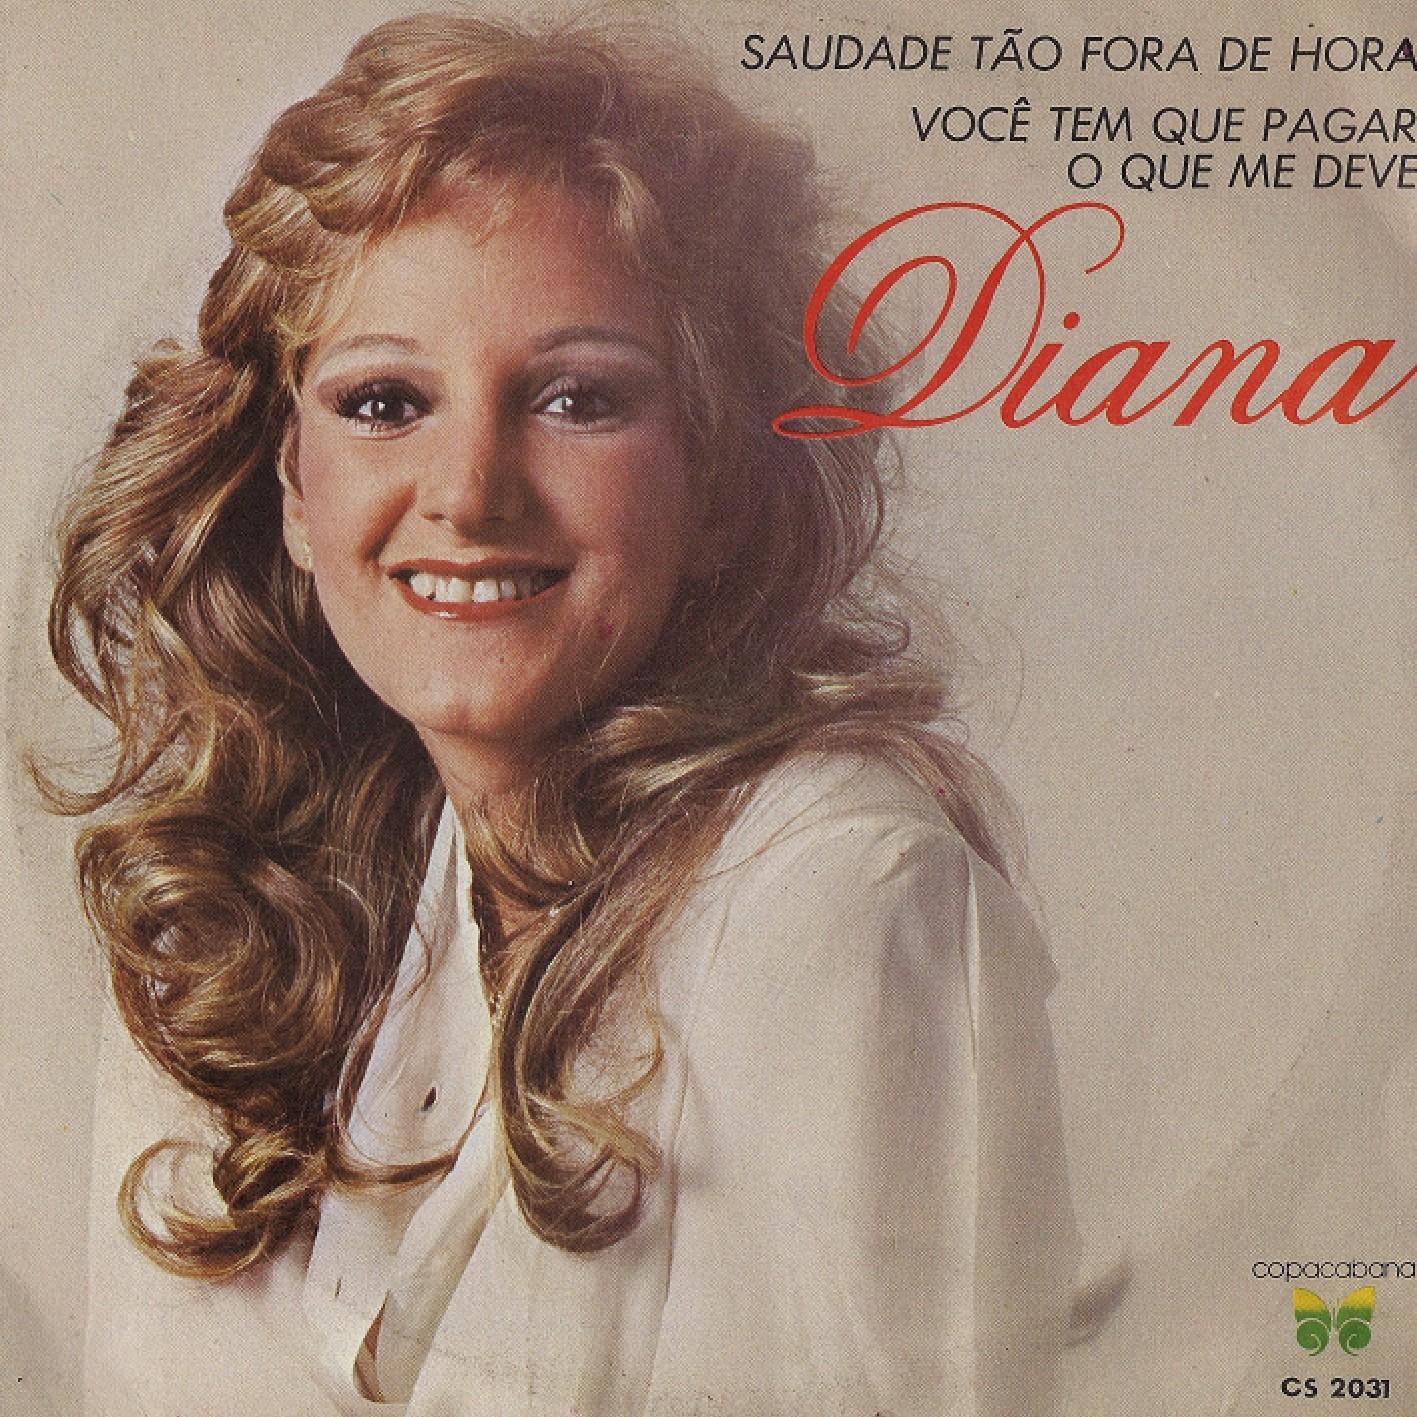 o cd da cantora diana jovem guarda